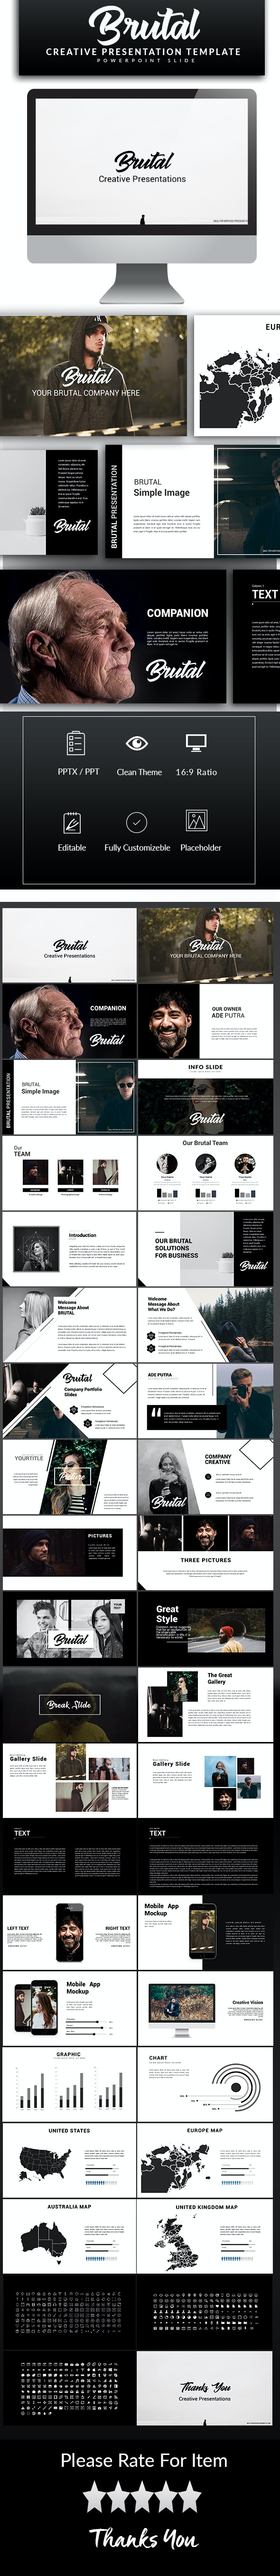 Brutal Powerpoint Template - PowerPoint Templates Presentation Templates